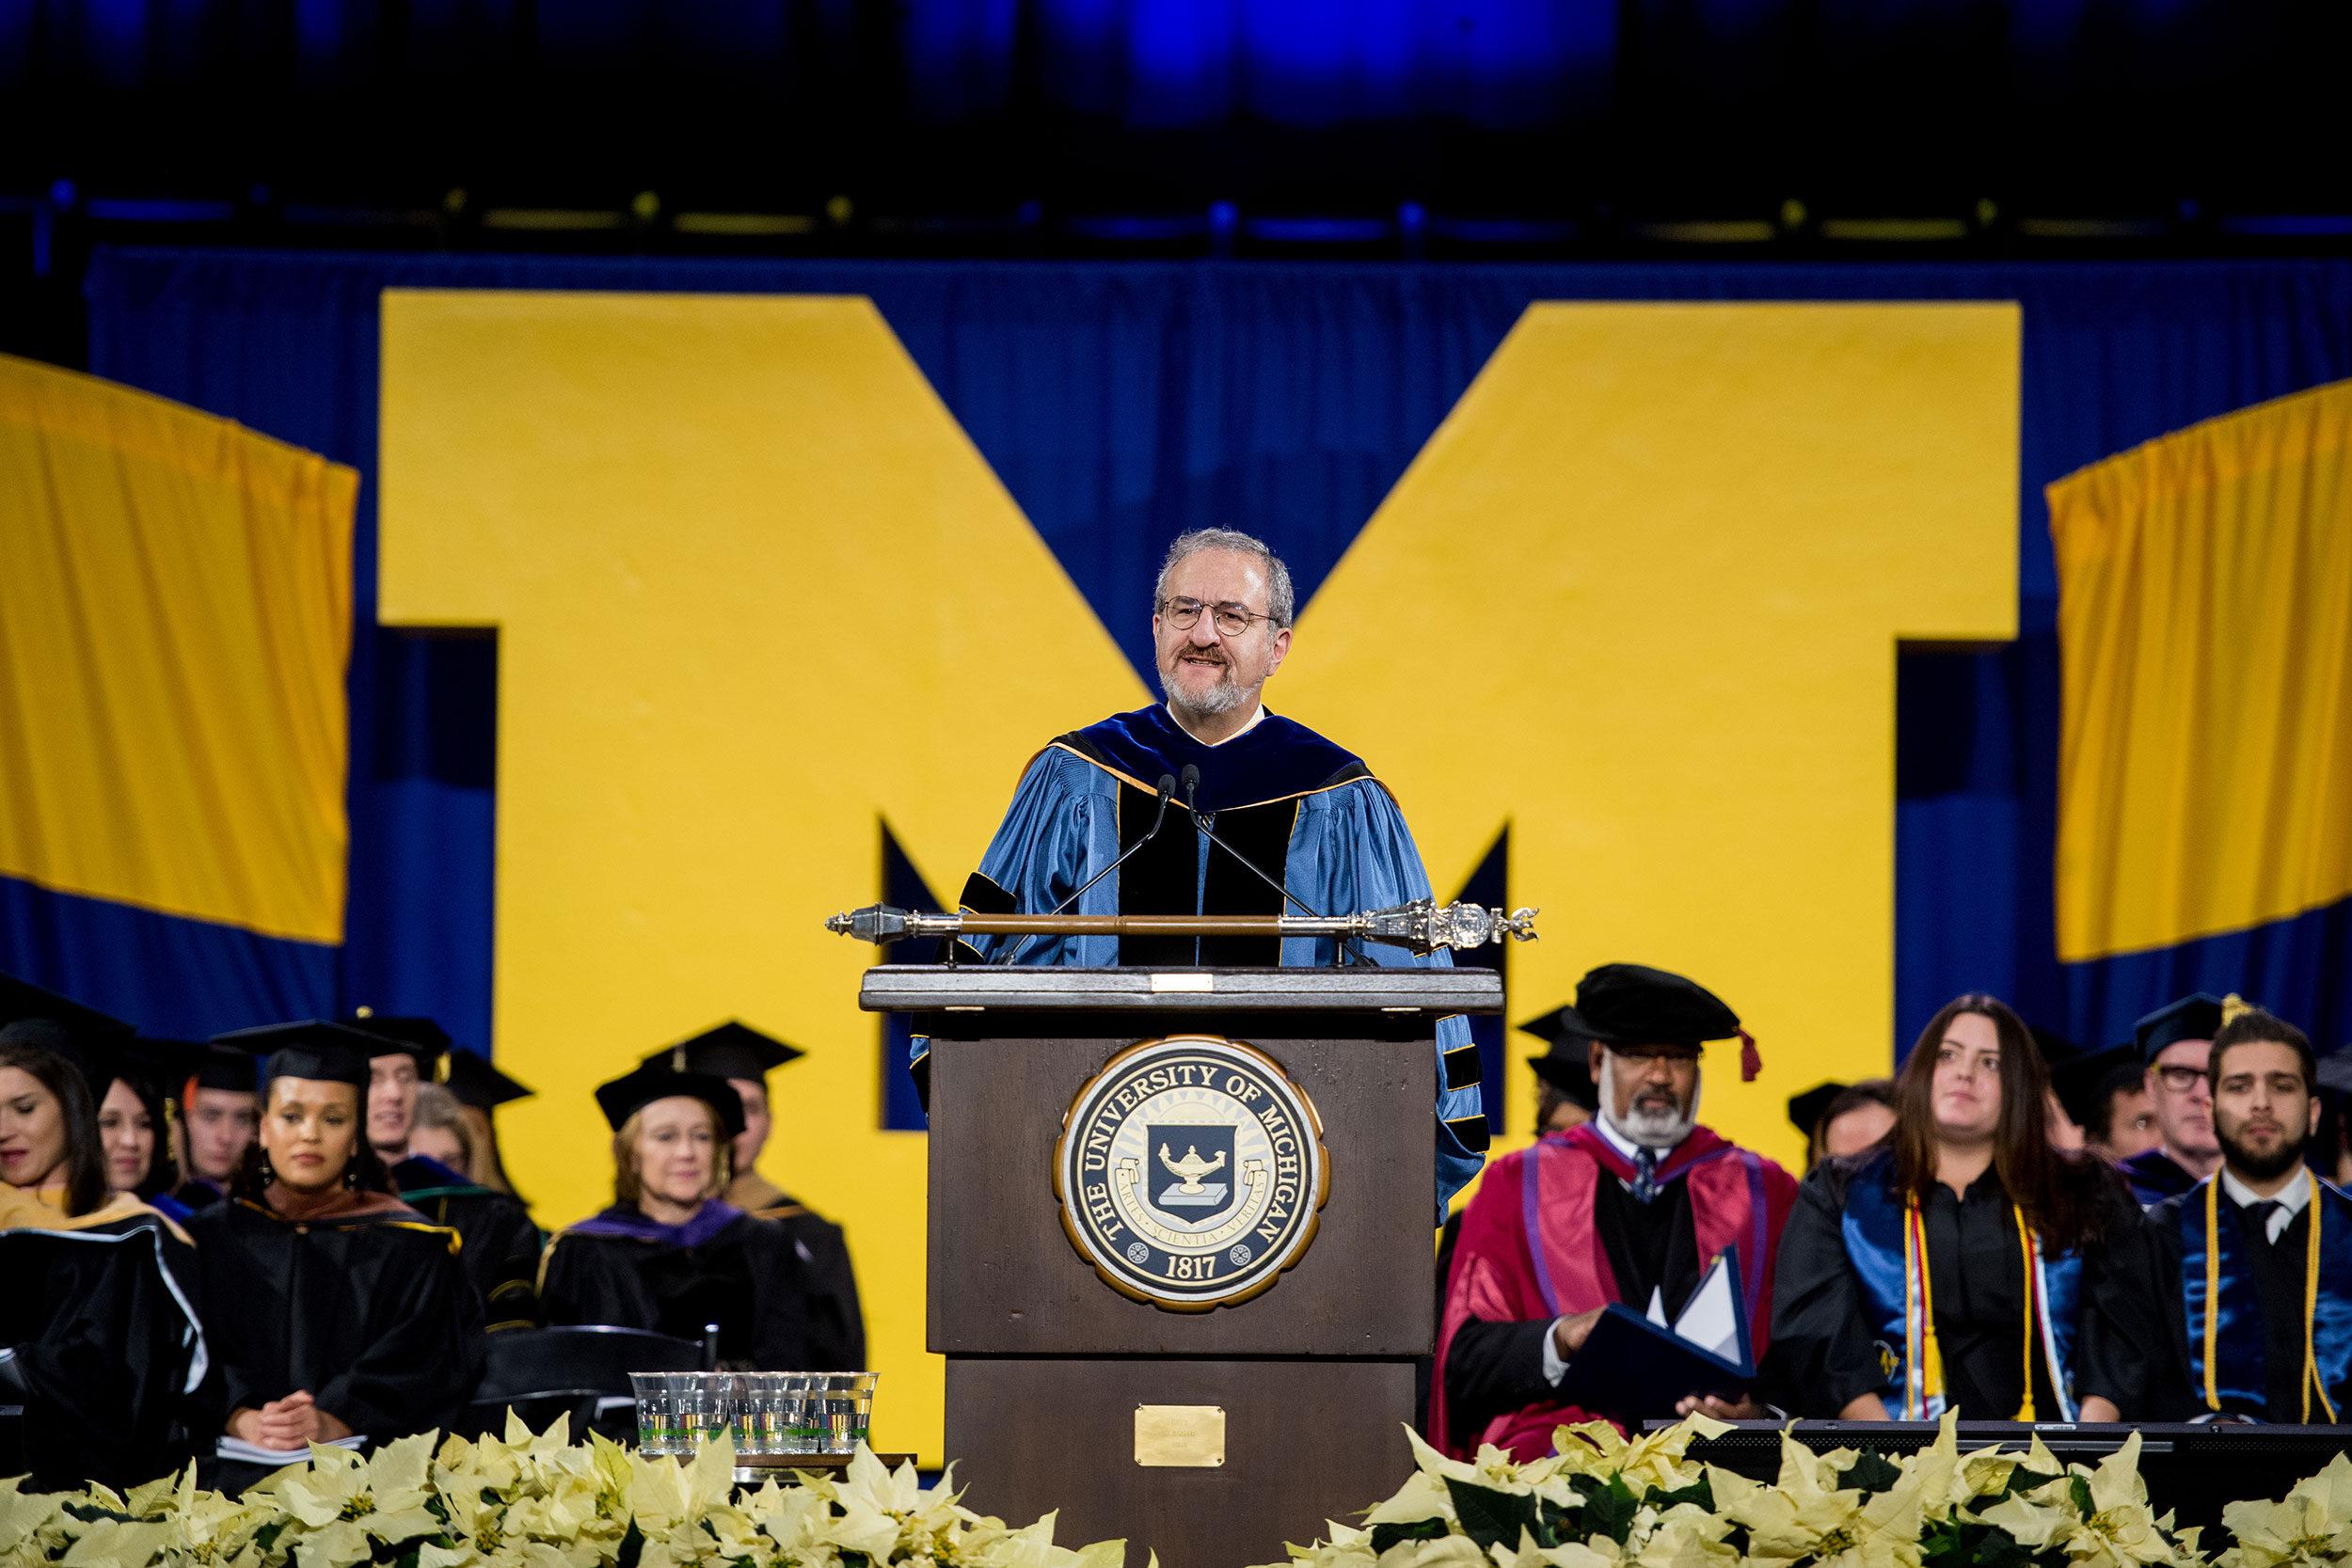 President Schlissel addresses graduates